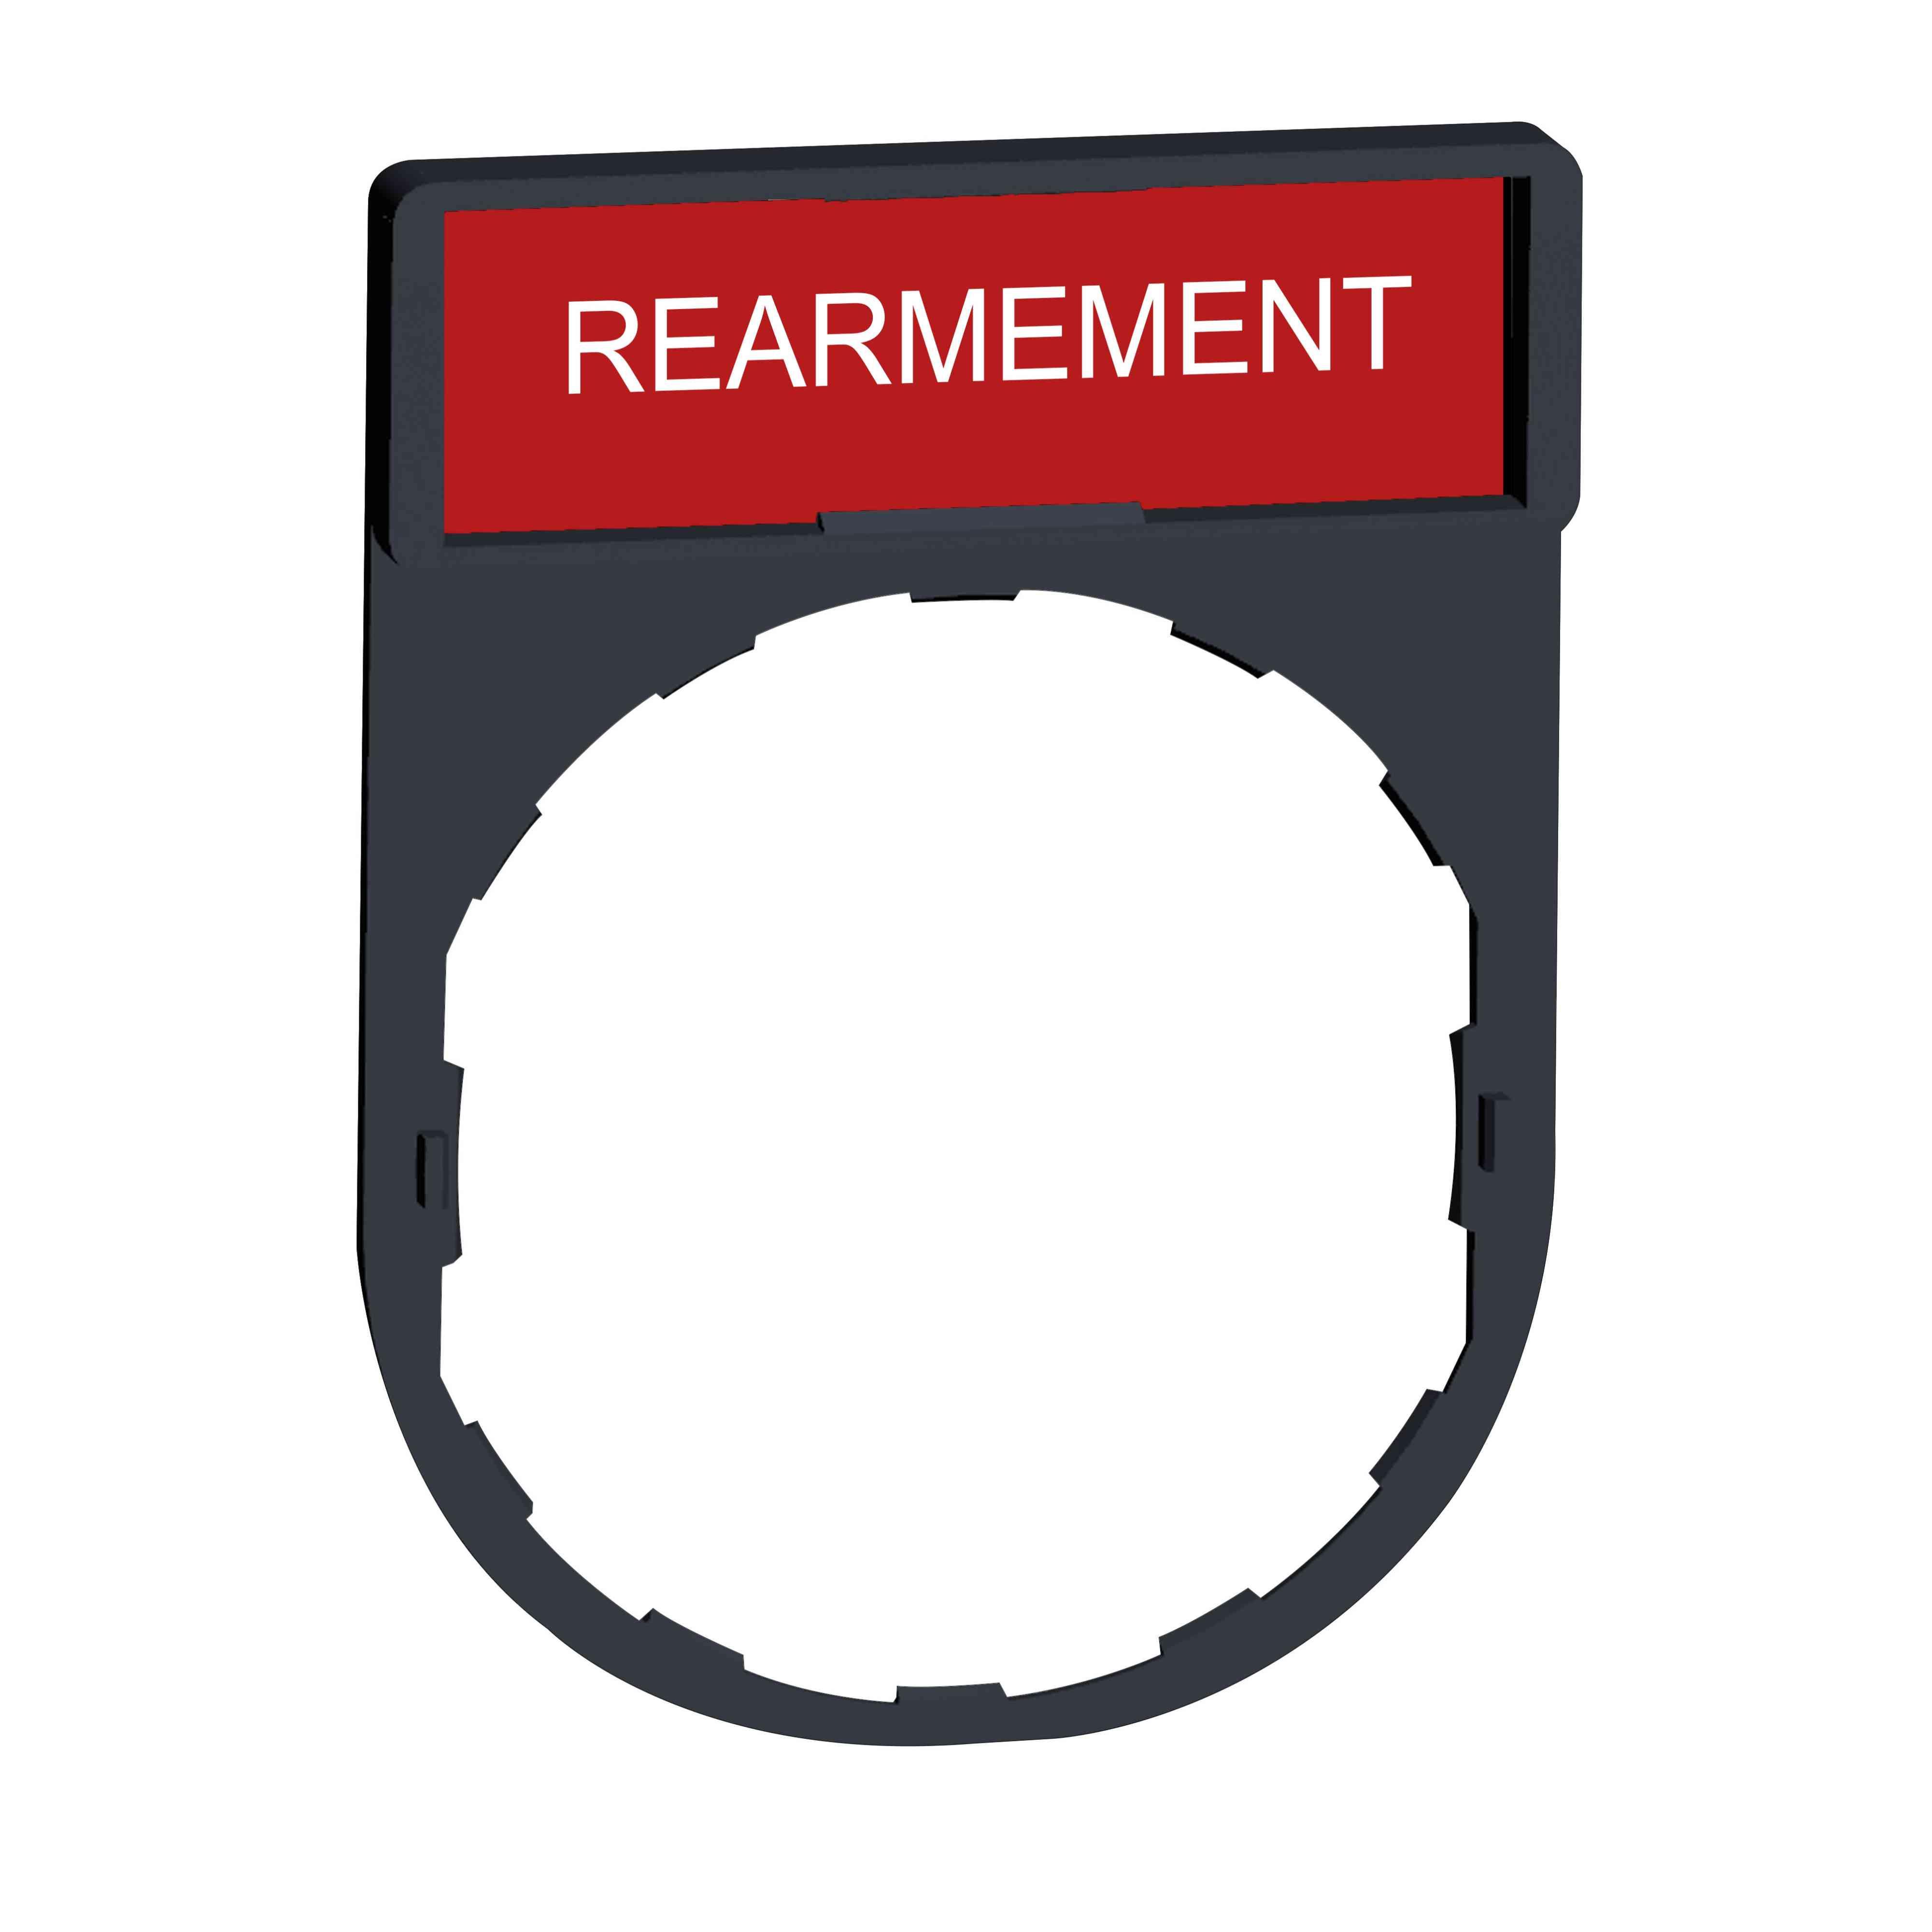 Nosilec legende 30 x 40 mm z legendo 8 x 27 mm z oznako REARMEMENT